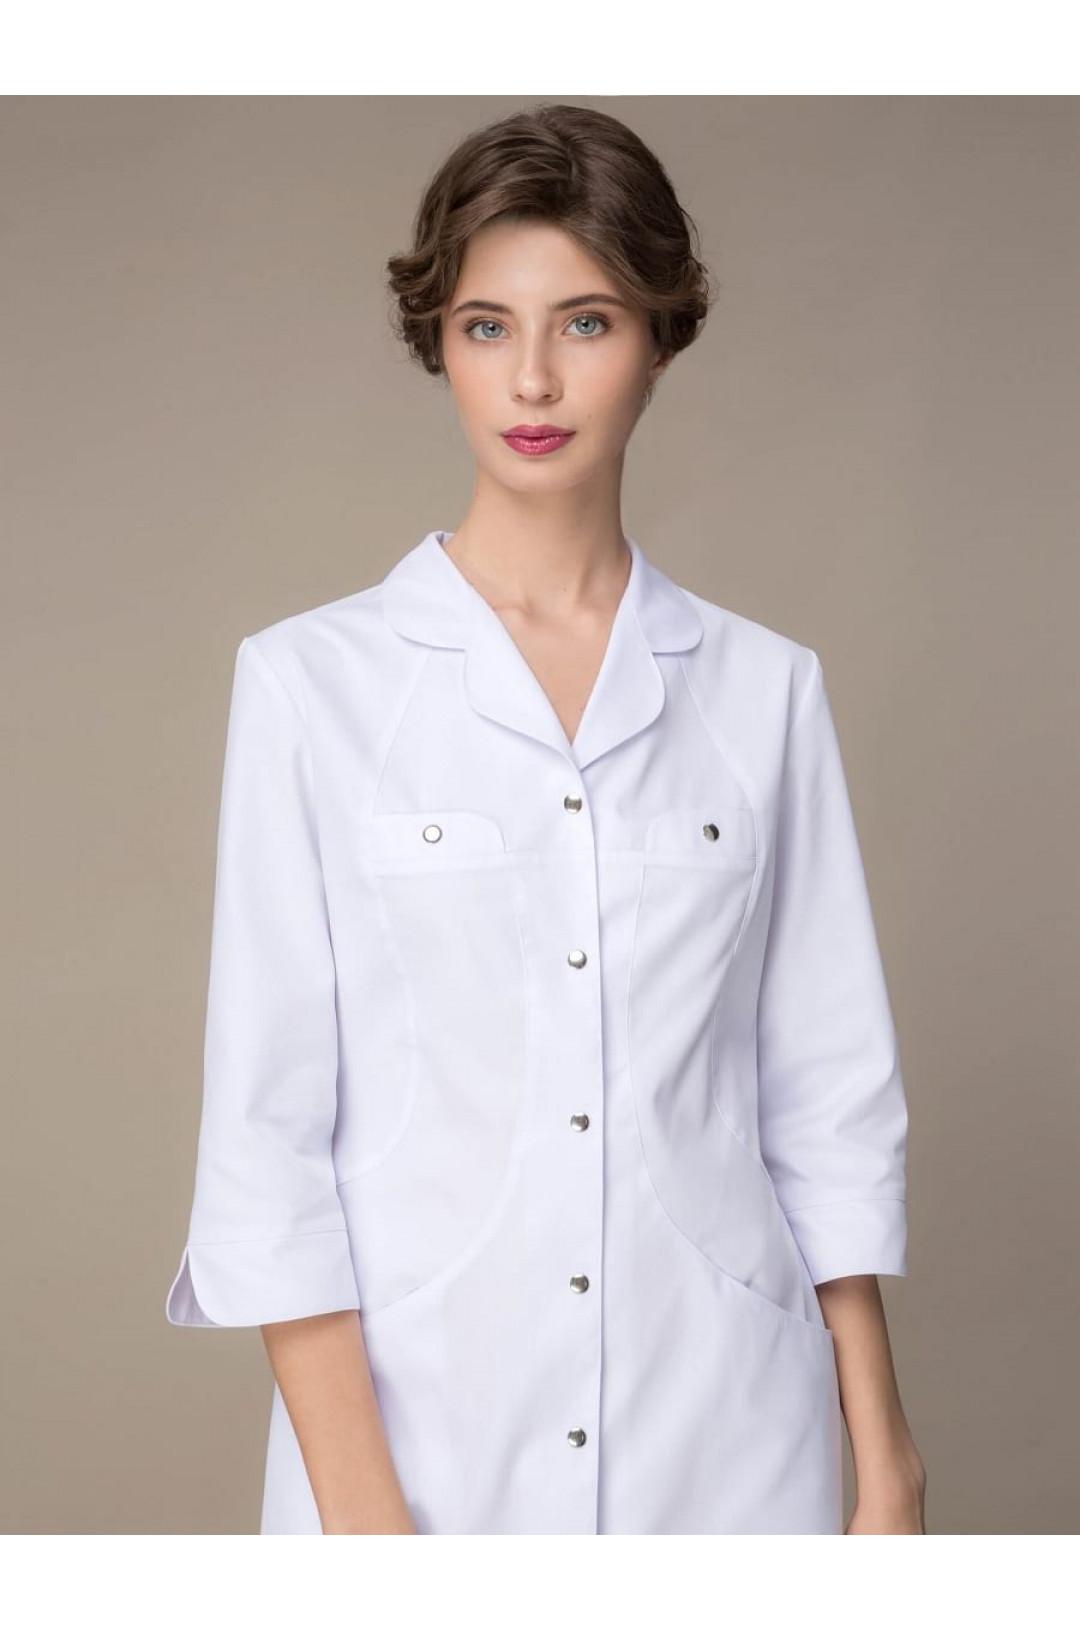 Халат медицинский женский 1-723 (белый, сатори)